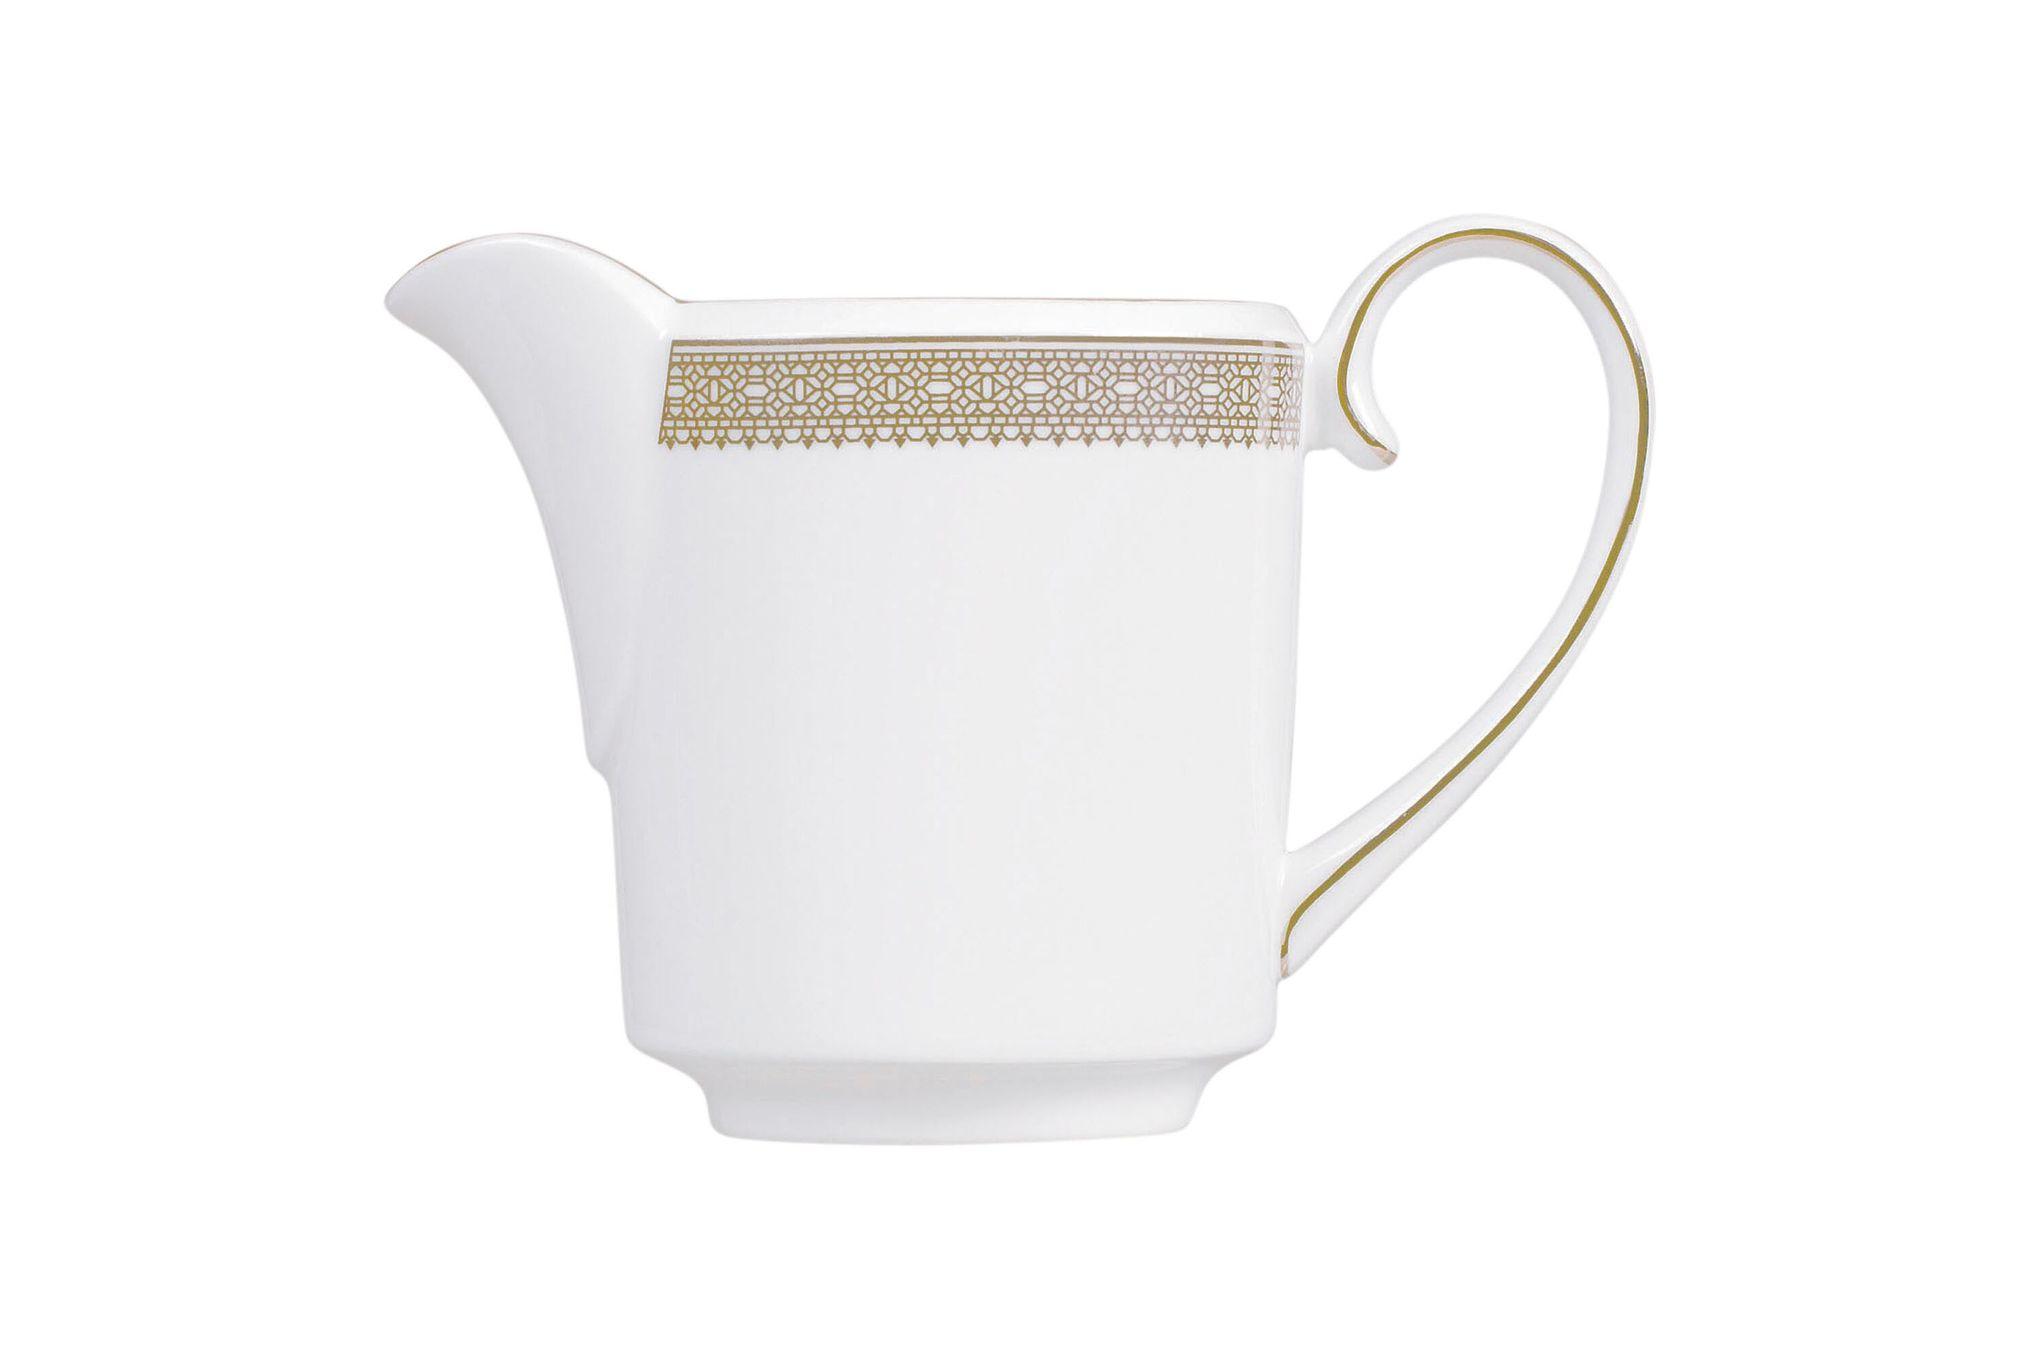 Vera Wang for Wedgwood Lace Gold Milk Jug 0.23l thumb 1